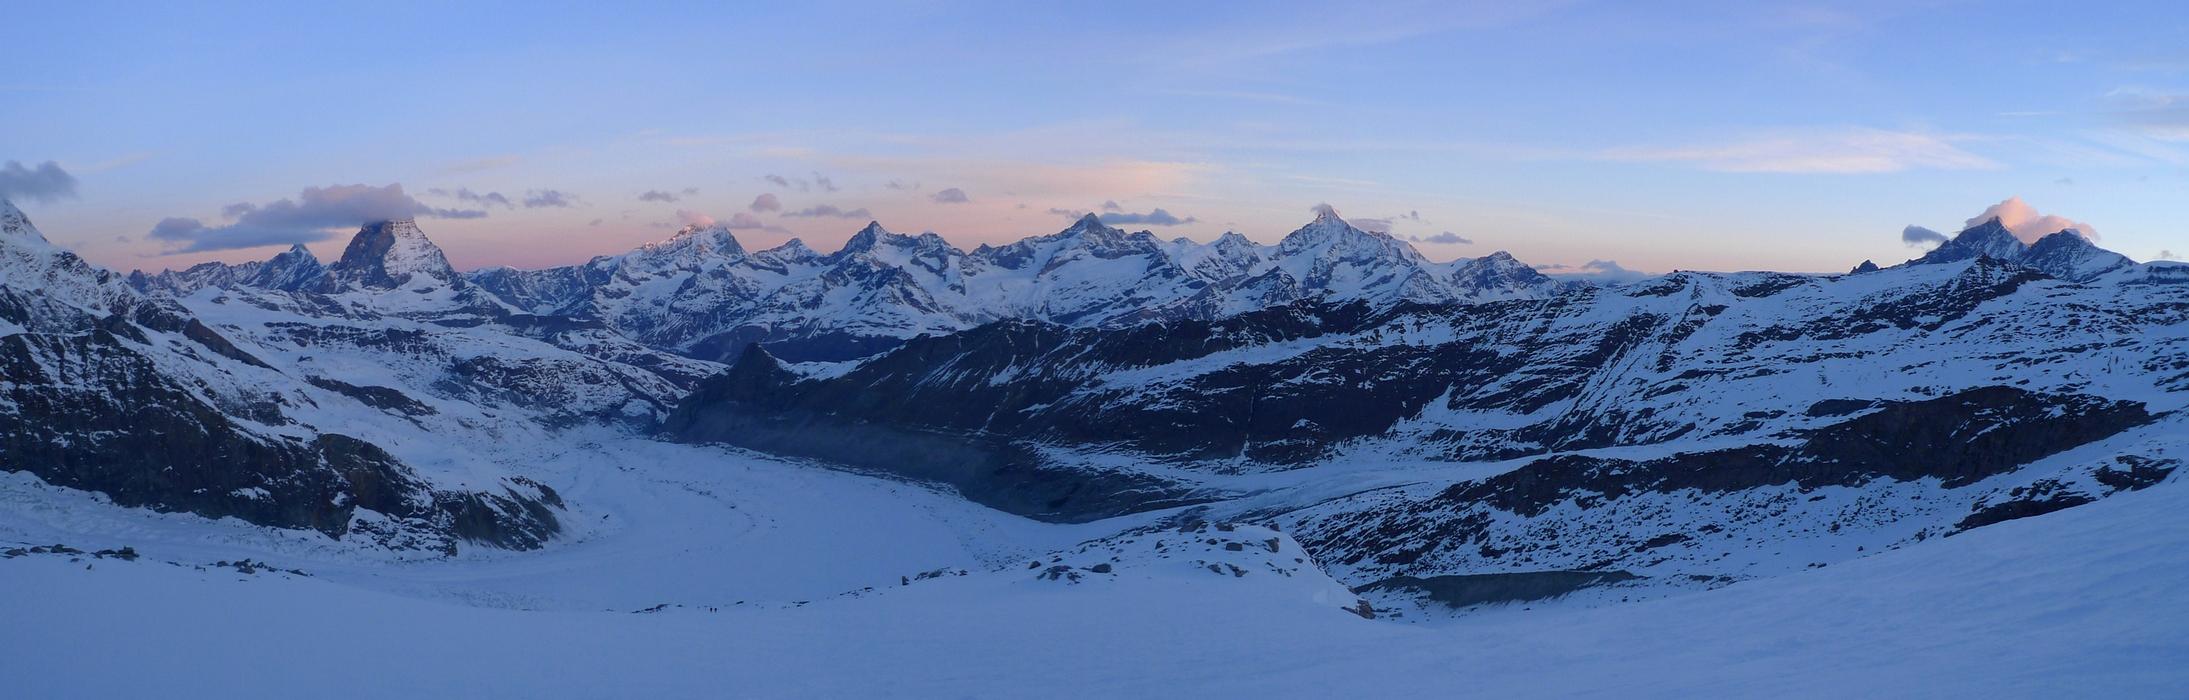 Dufourspitze / Punta Dufour - Monte Rosa Walliser Alpen / Alpes valaisannes Švýcarsko panorama 25